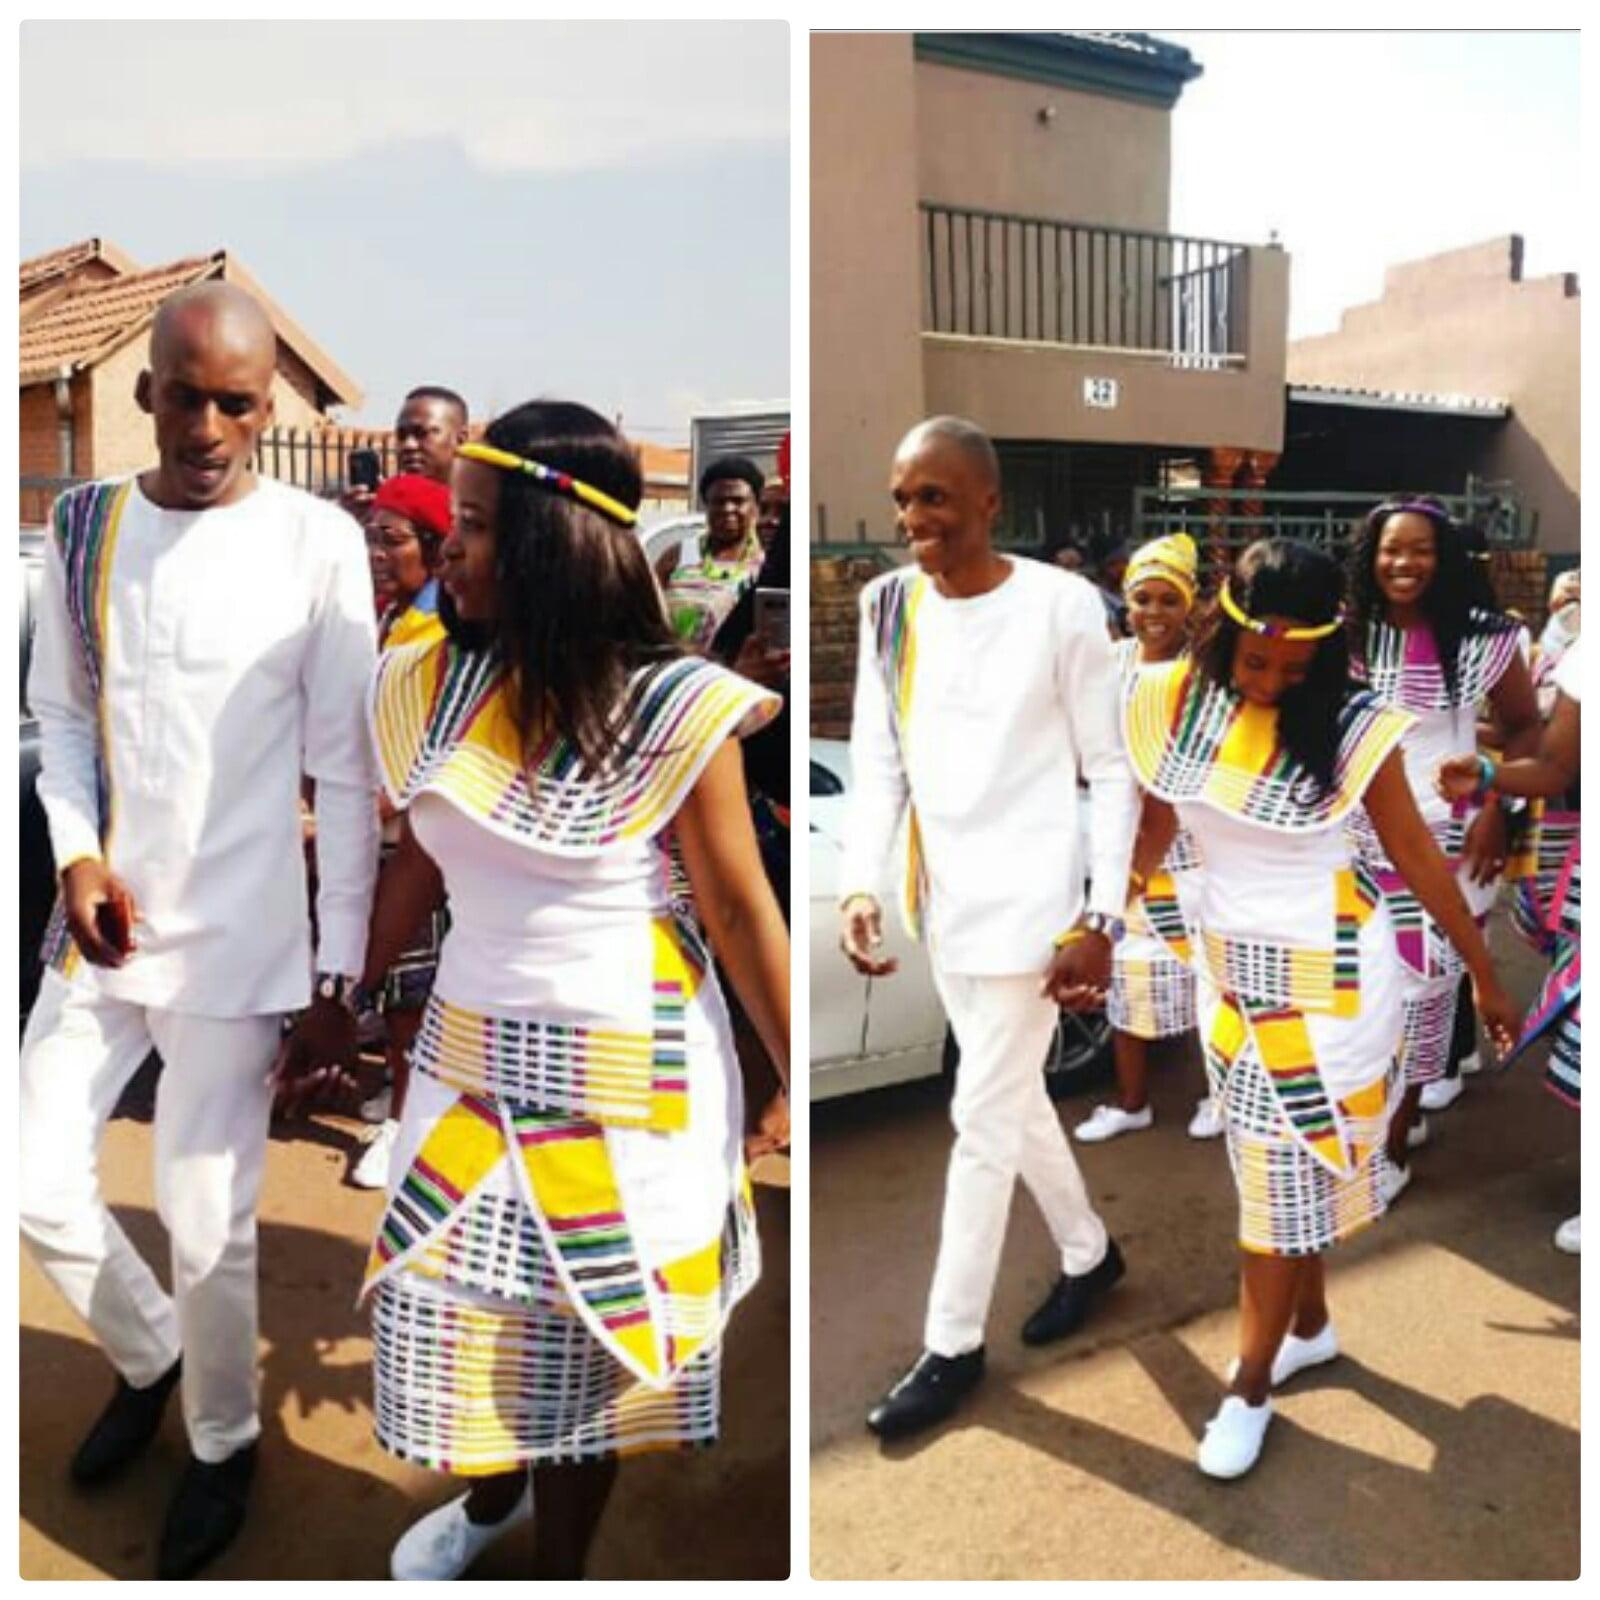 Venda Traditional Modern Dresses: Bride & Groom In Beautiful Venda Traditional Wedding